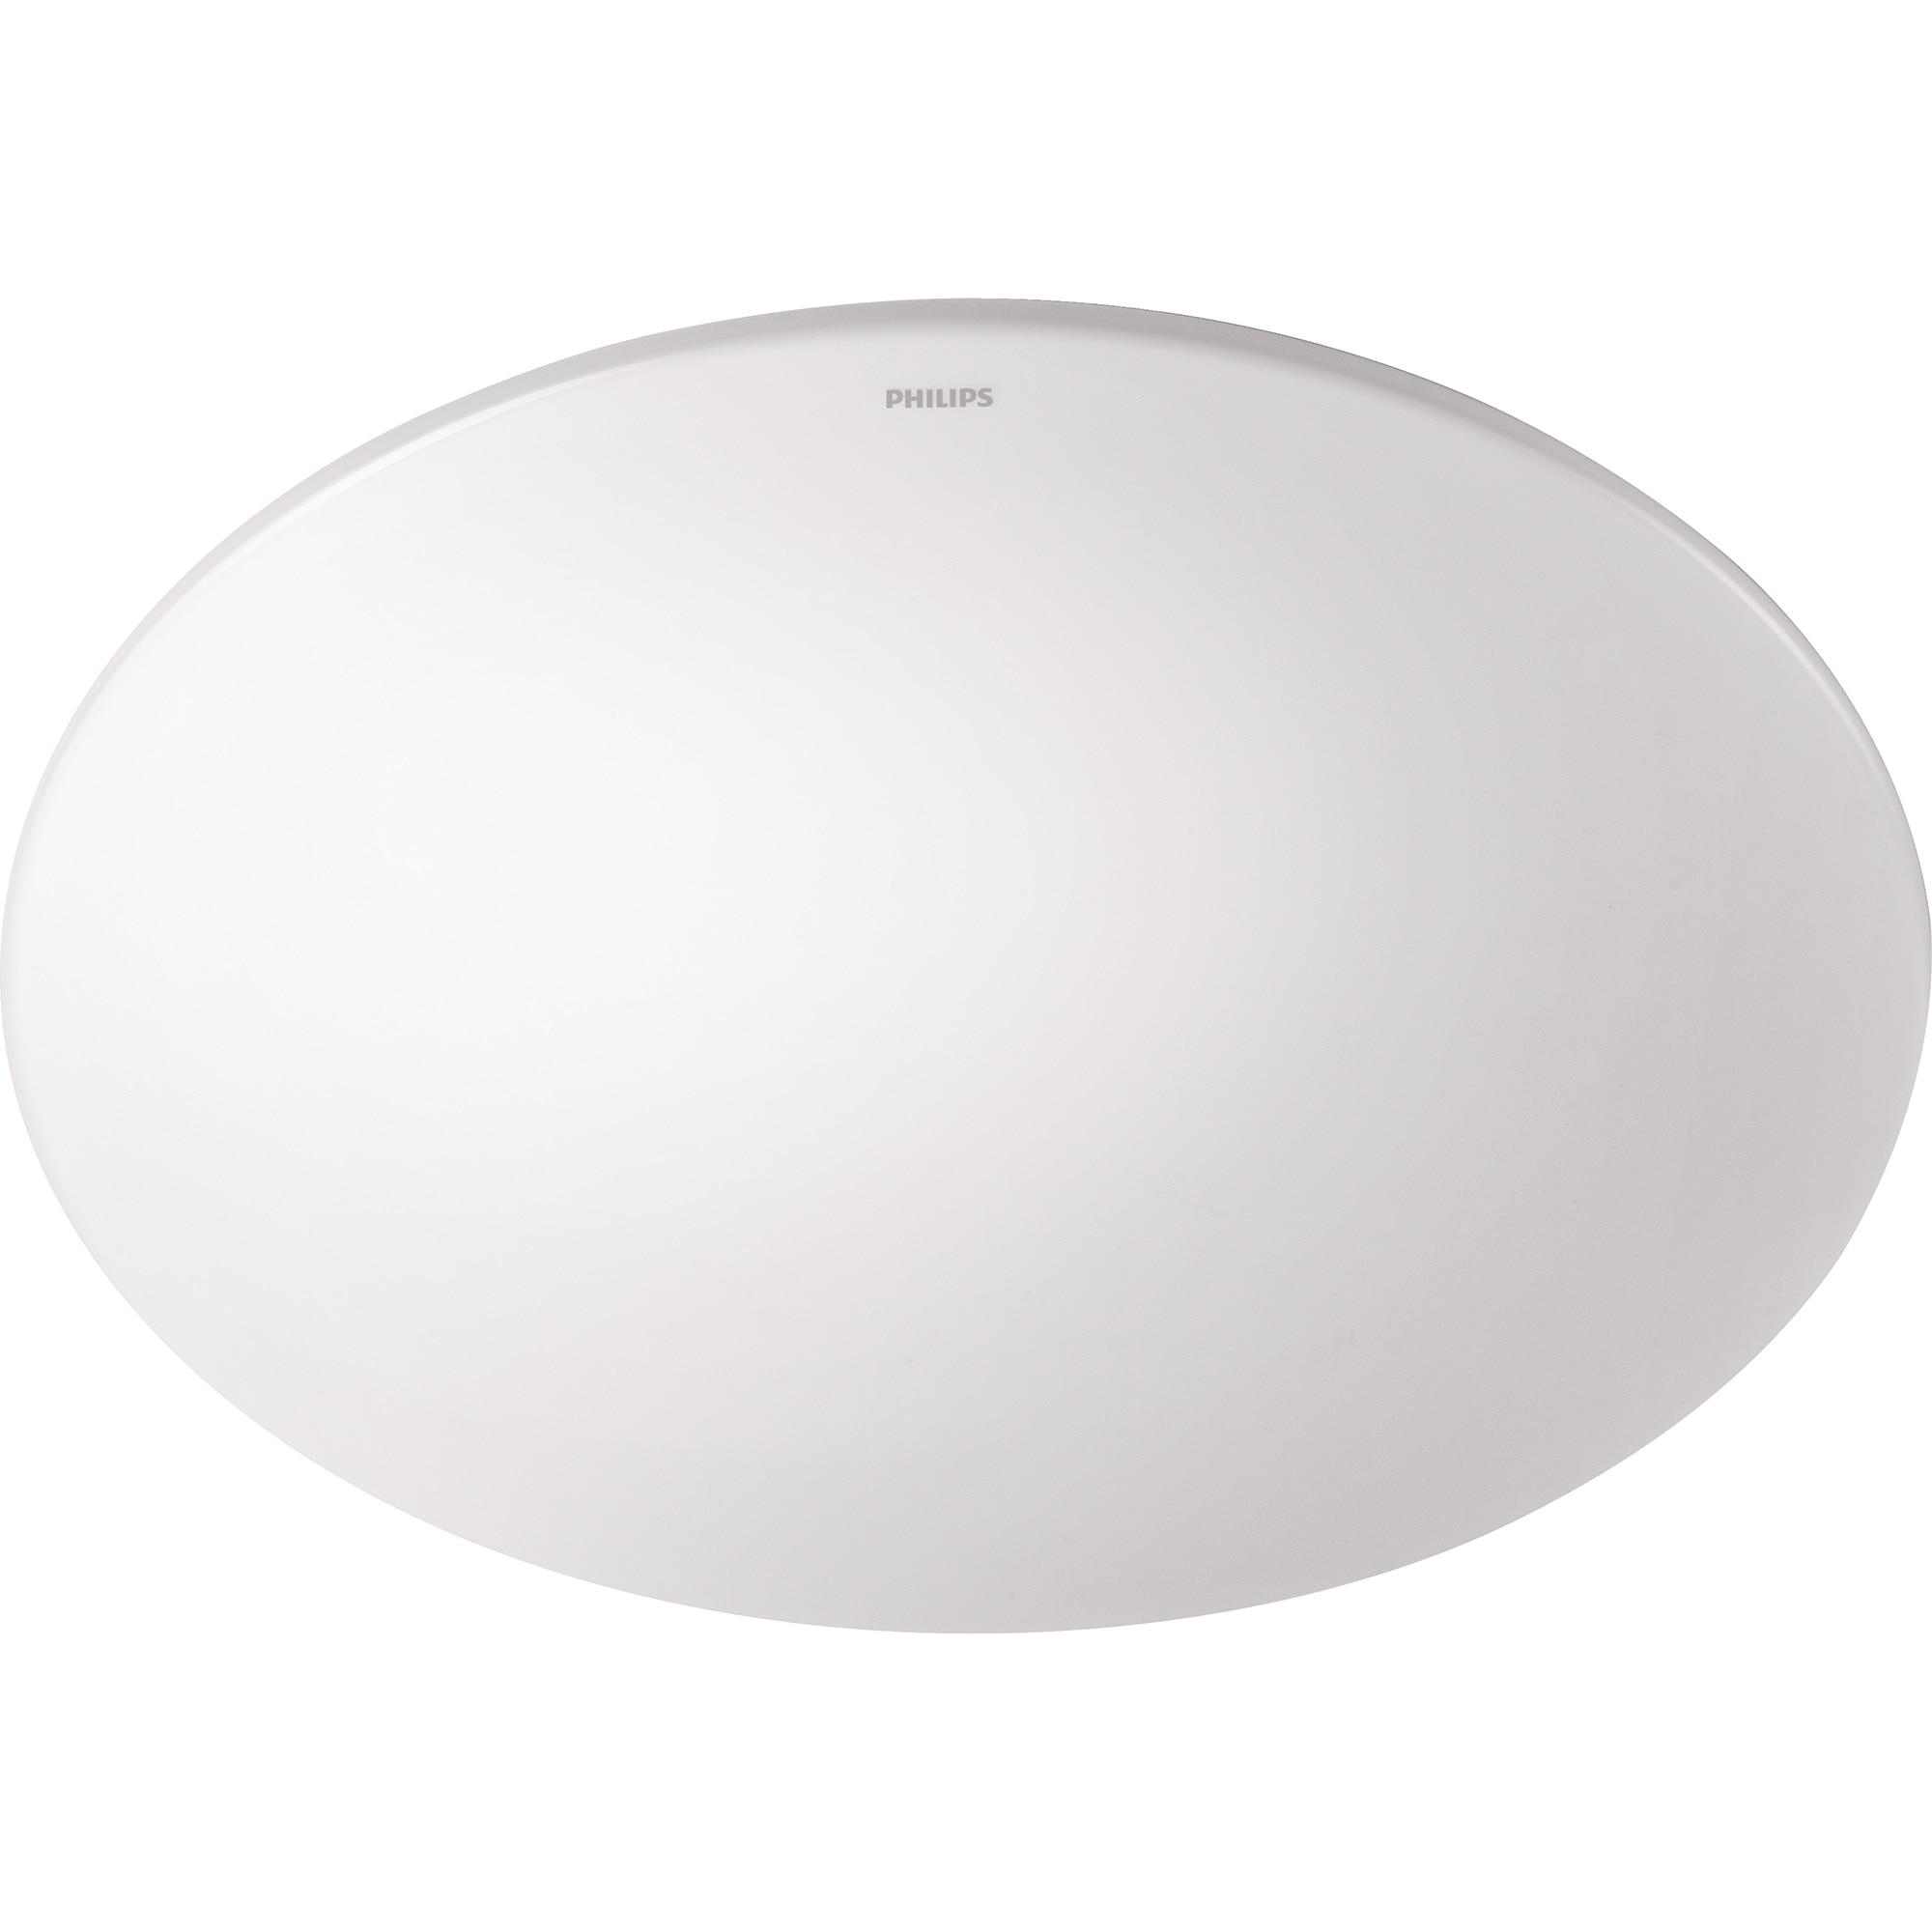 Fotografie Plafoniera LED integrat Philips Mauve, 4x5.5W, 2000 lm, lumina alba calda